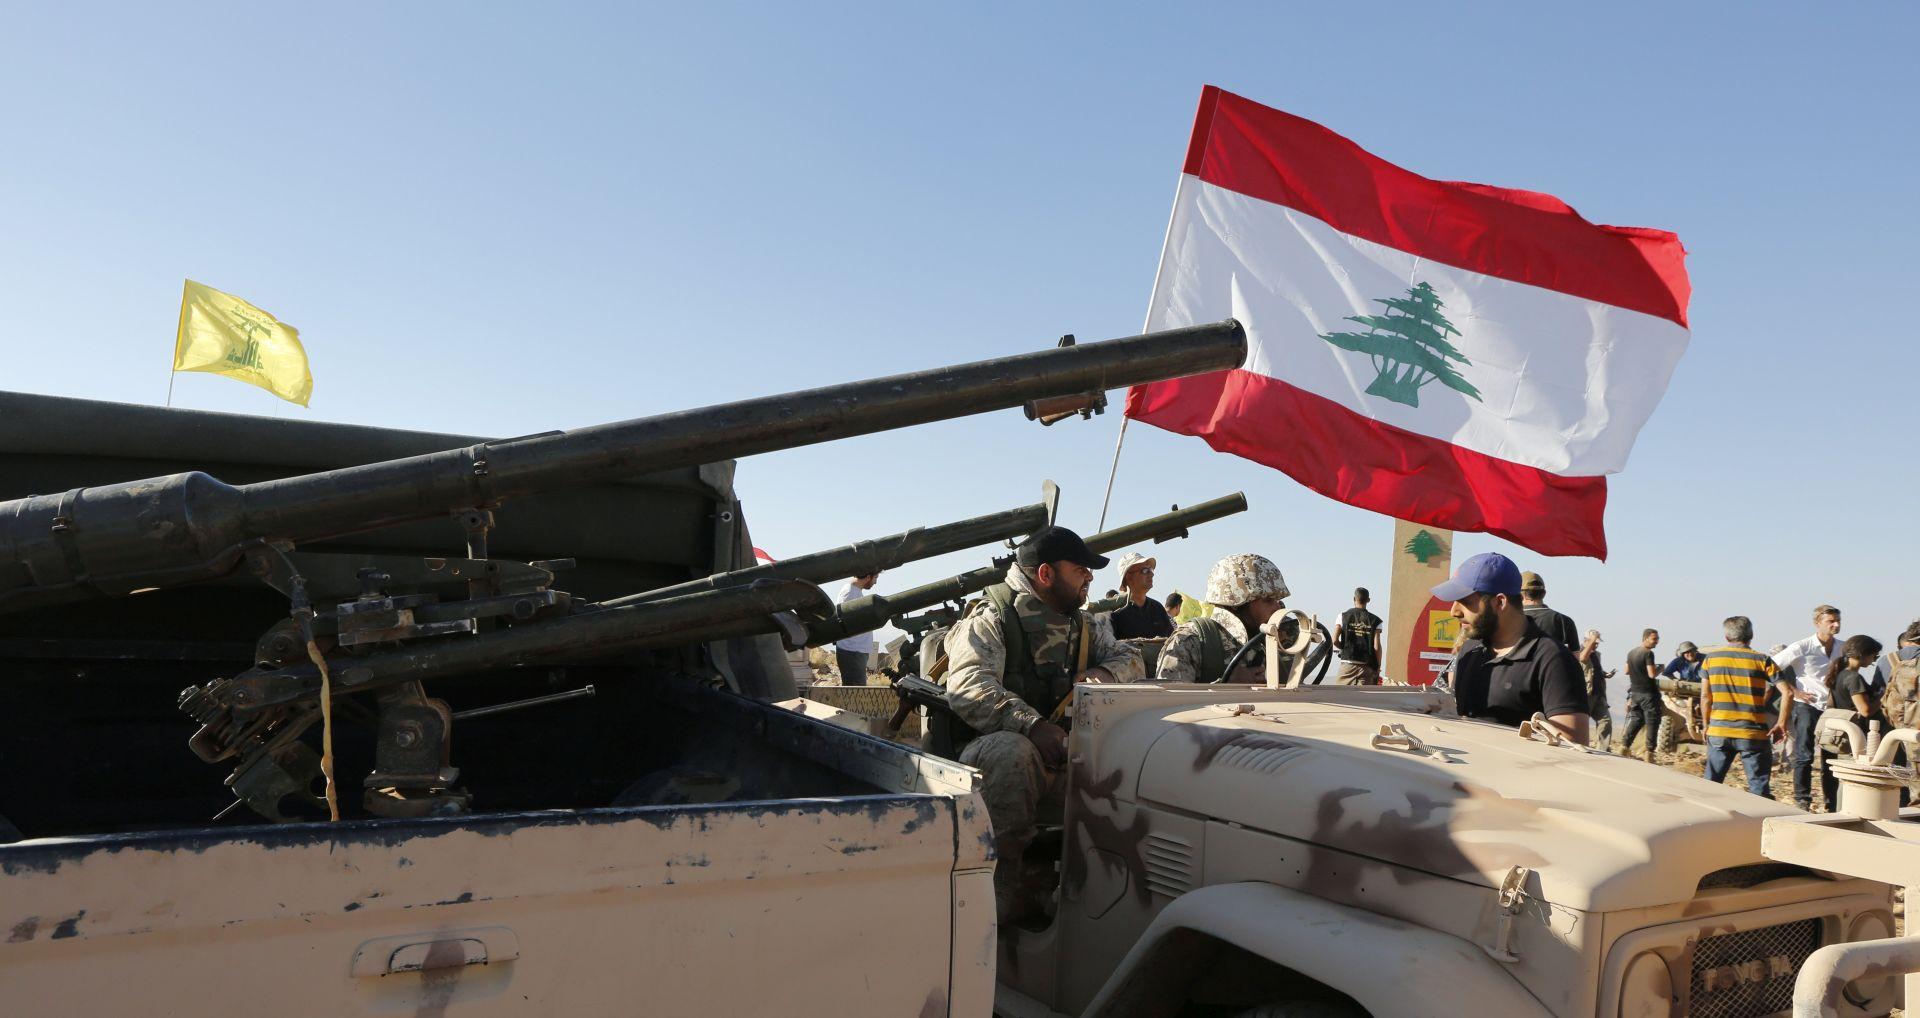 Libanonska vojska pronašla protuzrakoplovne projektile u napuštenom skladištu Islamske države